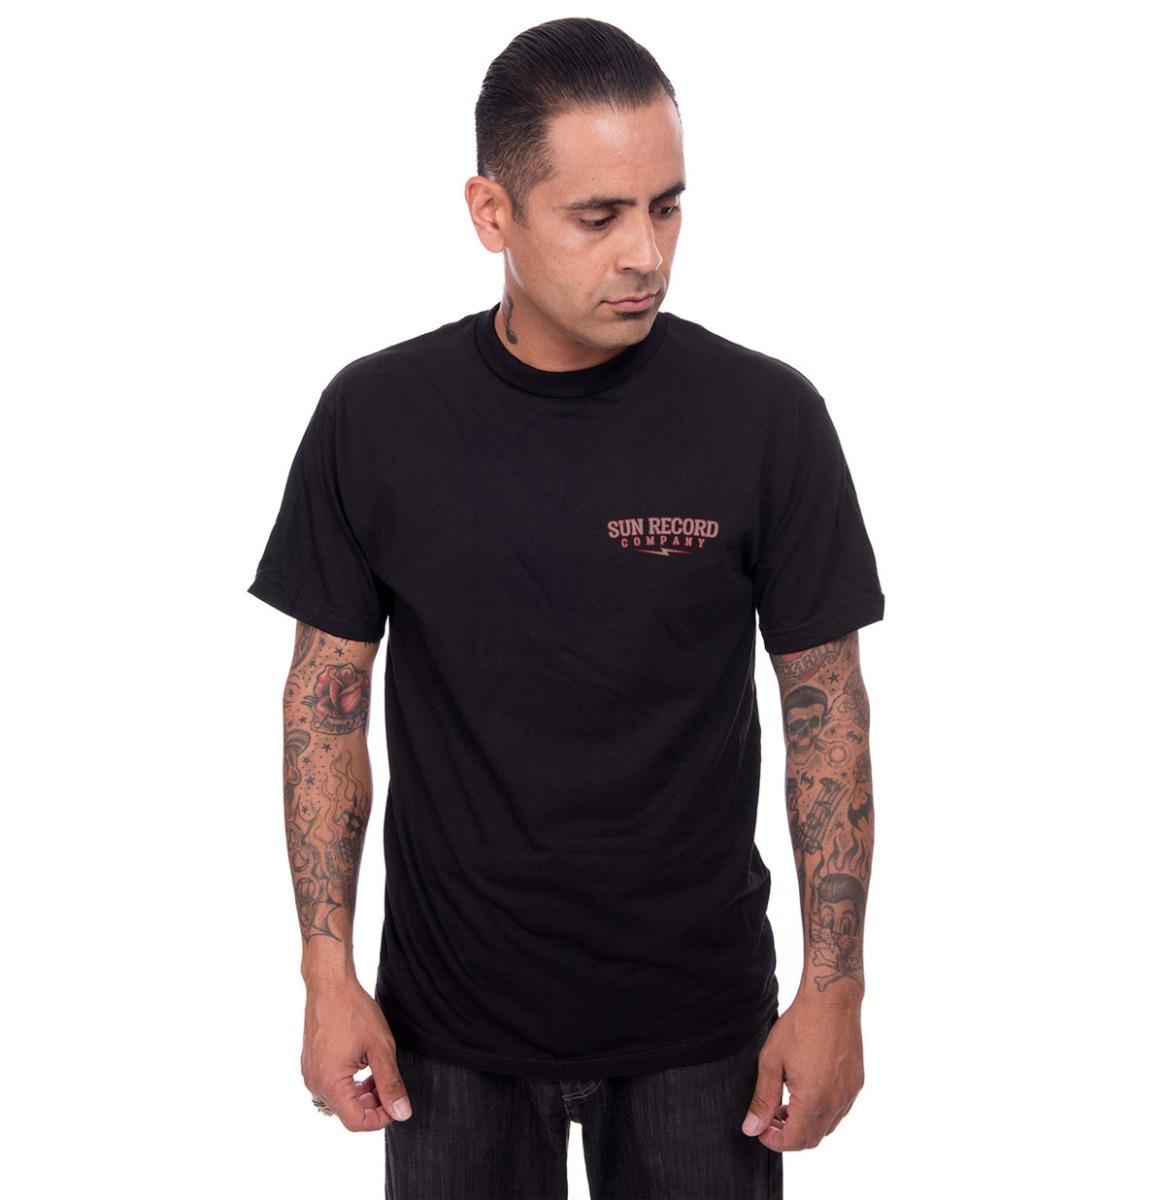 Sun Records That Rockabilly Sound T-Shirt, Black